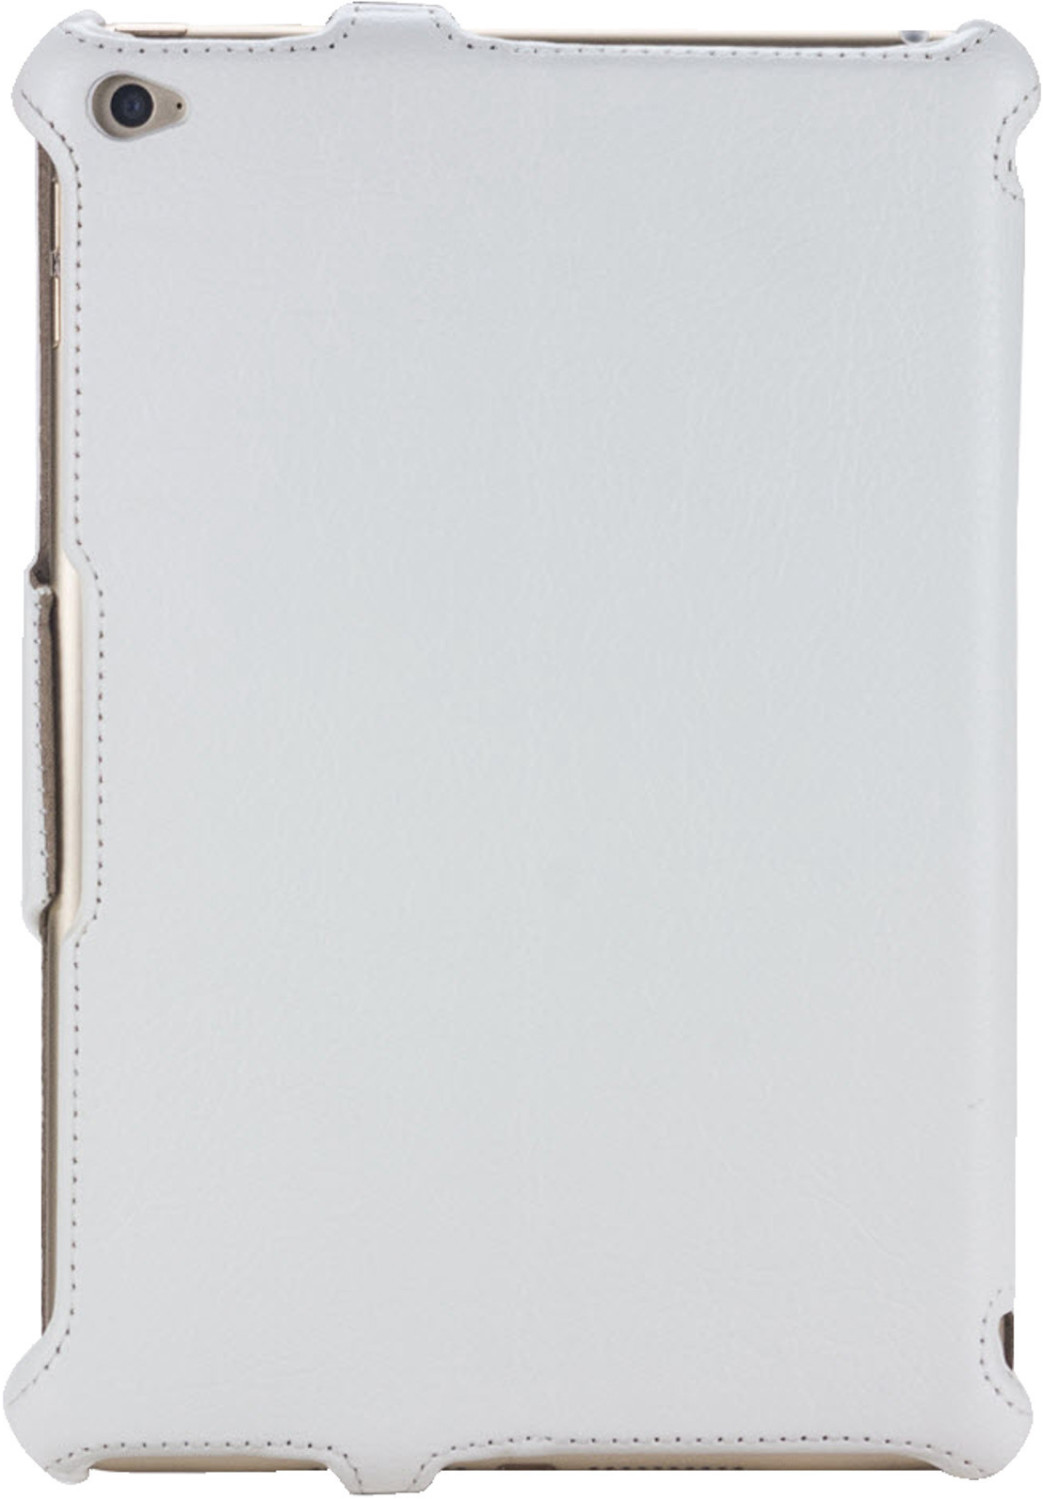 Image of Gecko Covers Slimfit Case iPad Mini 4 white (8718969053754)